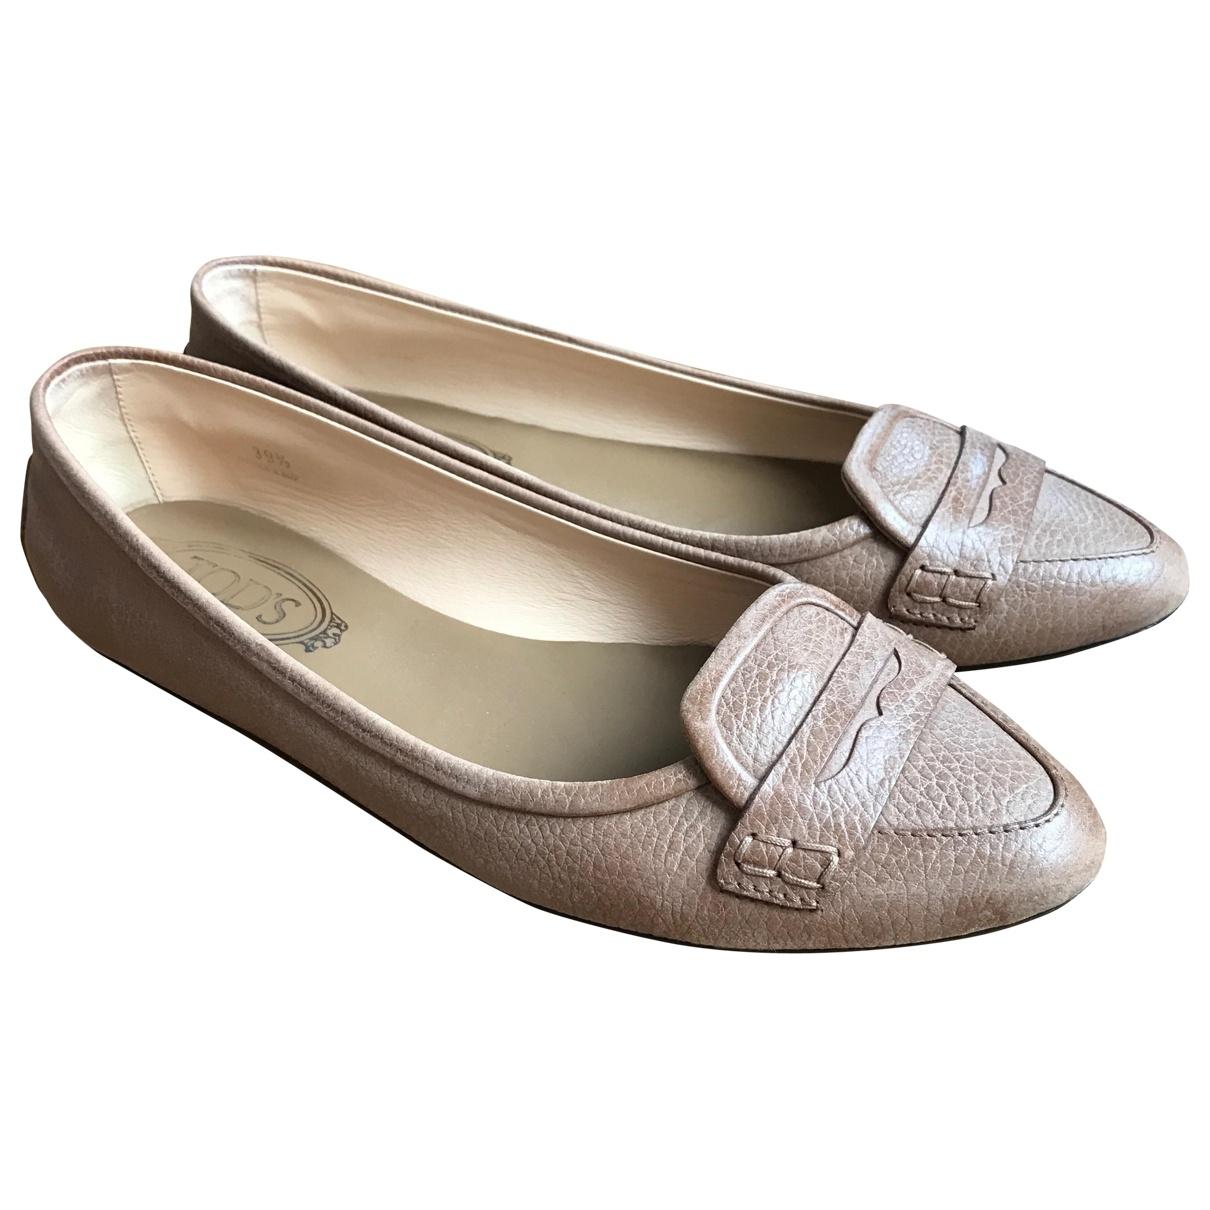 Tod's \N Beige Leather Flats for Women 39.5 EU